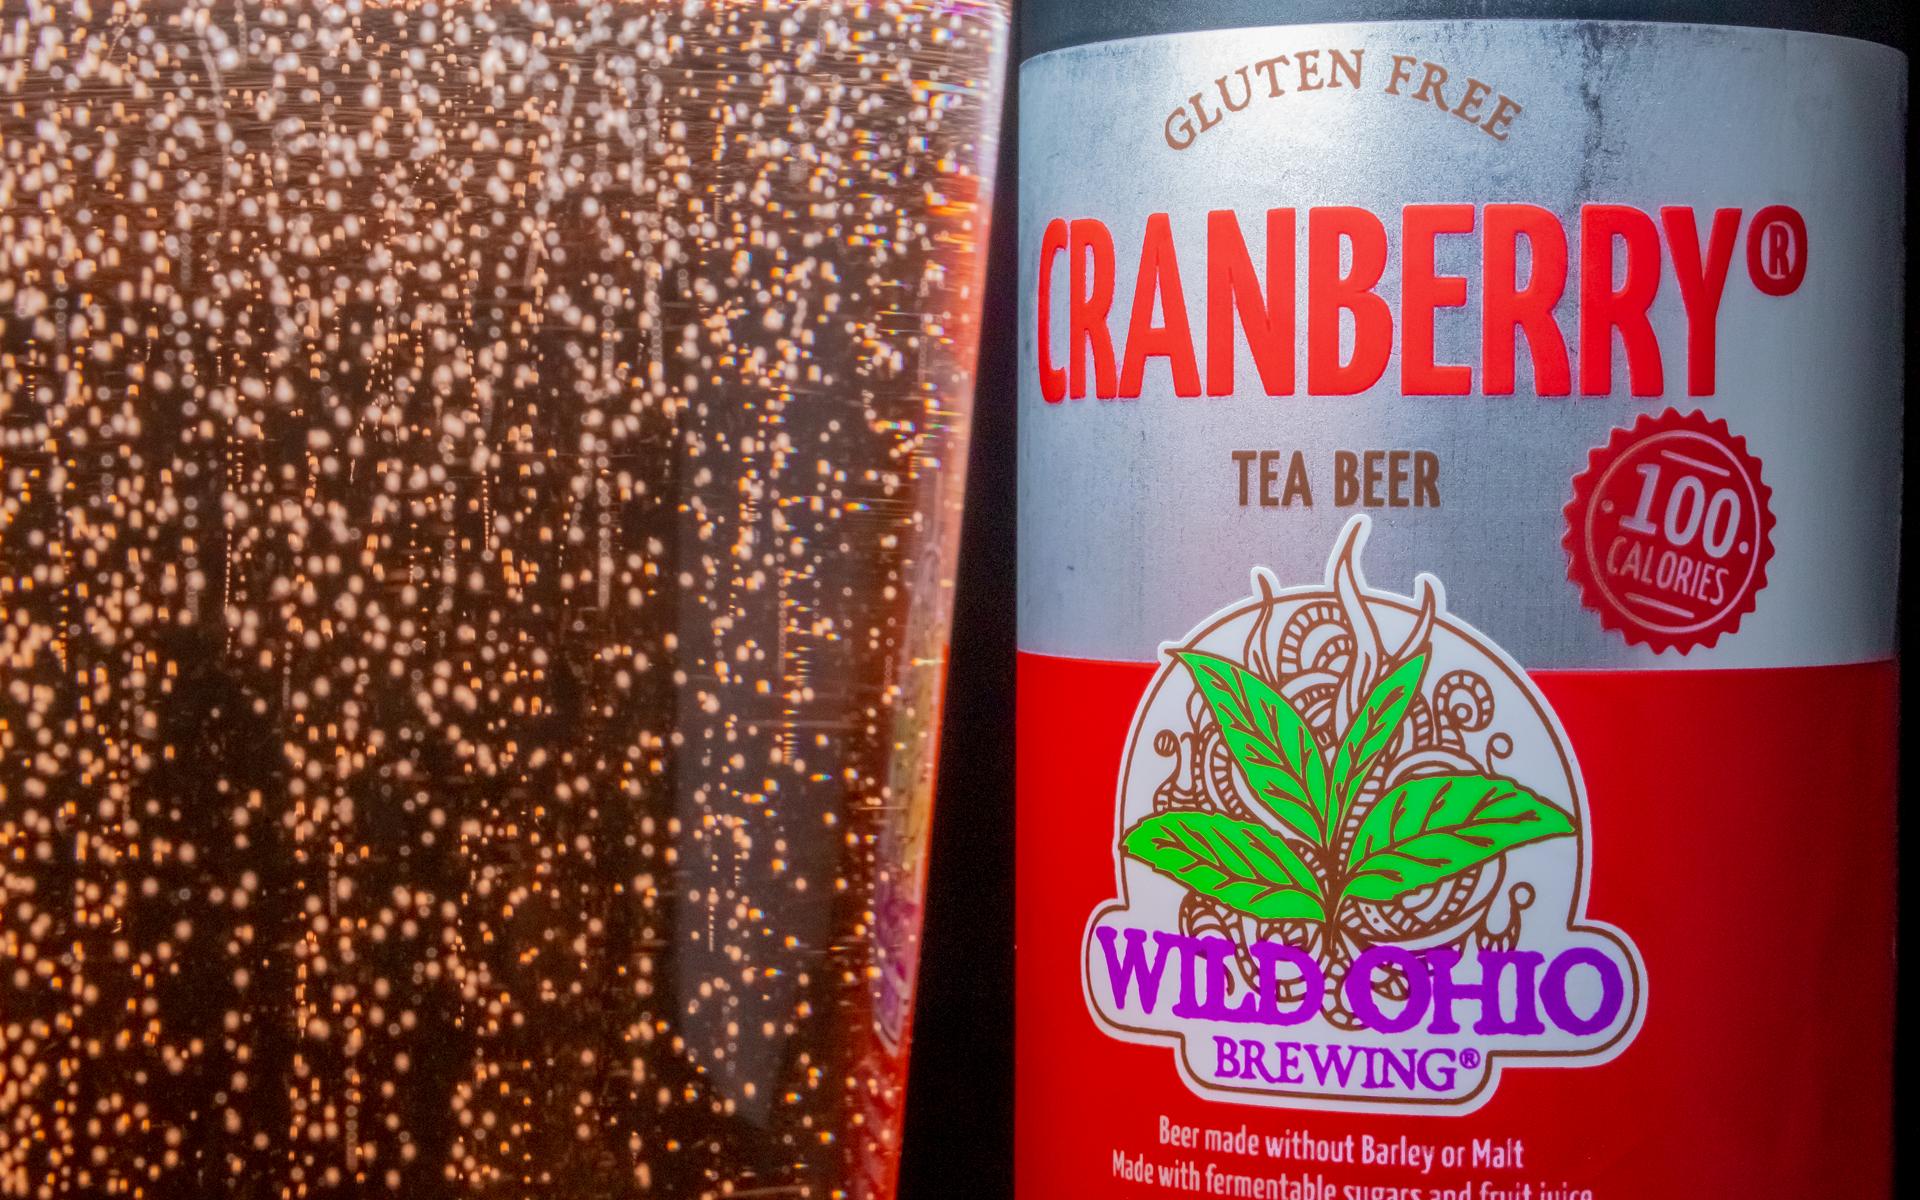 Wild Ohio Cranberry Tea Beer